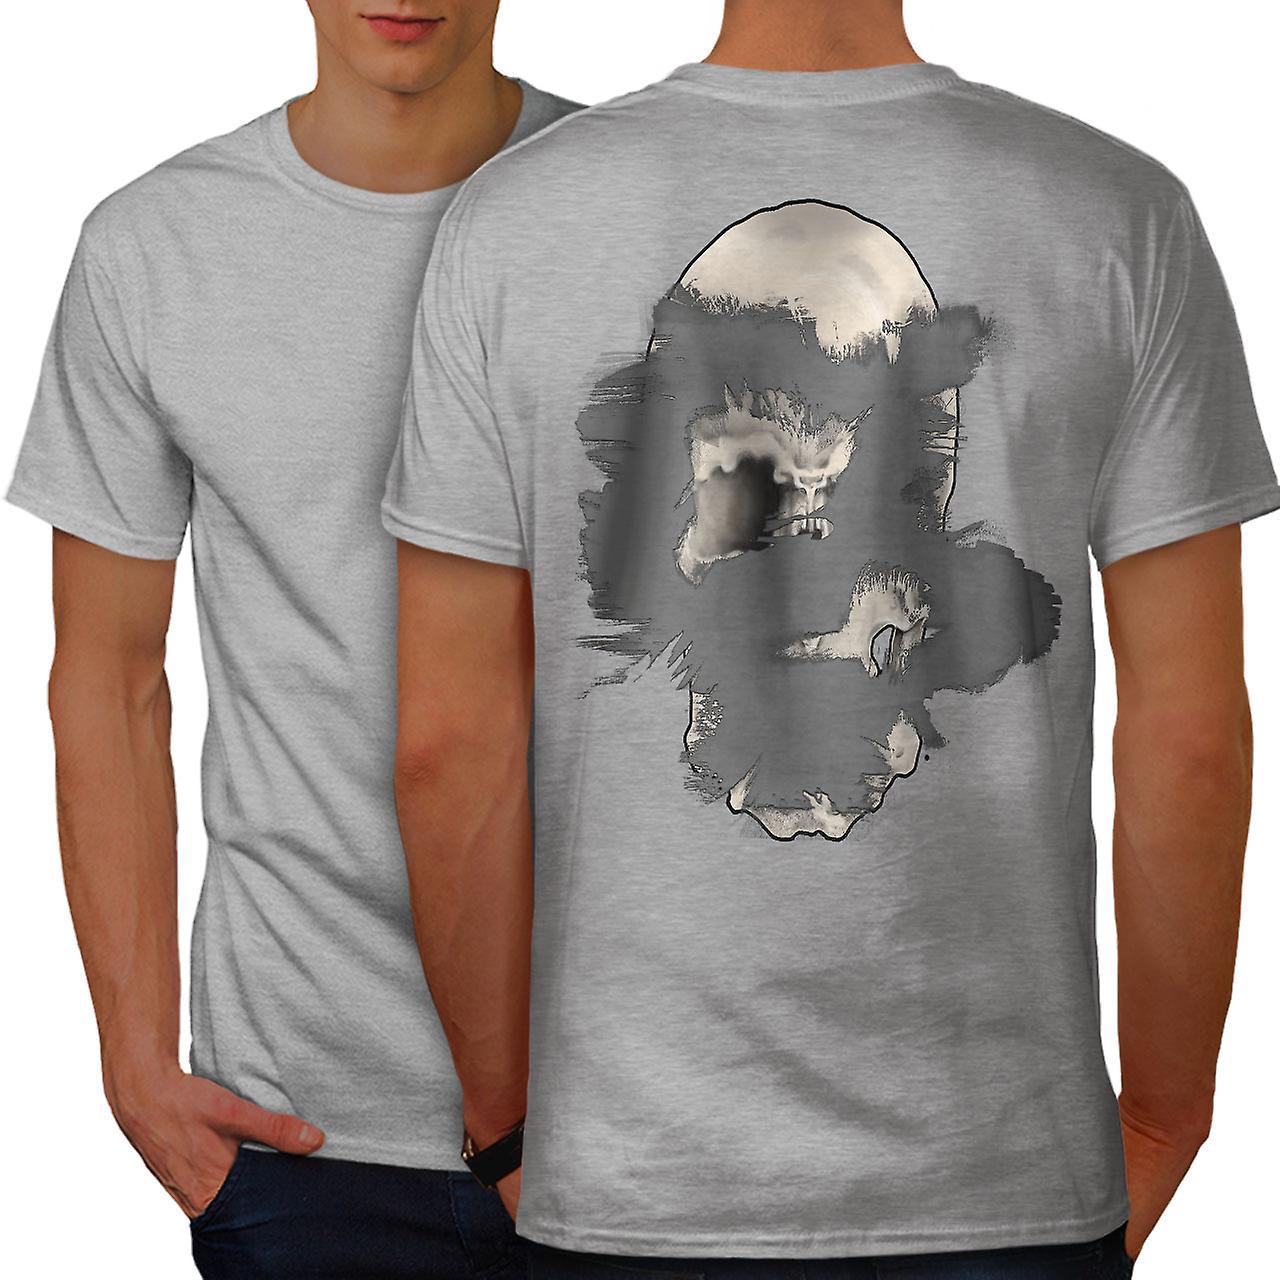 Anatomie Metal-Rock Männer graut-Hemd zurück | Wellcoda | Fruugo